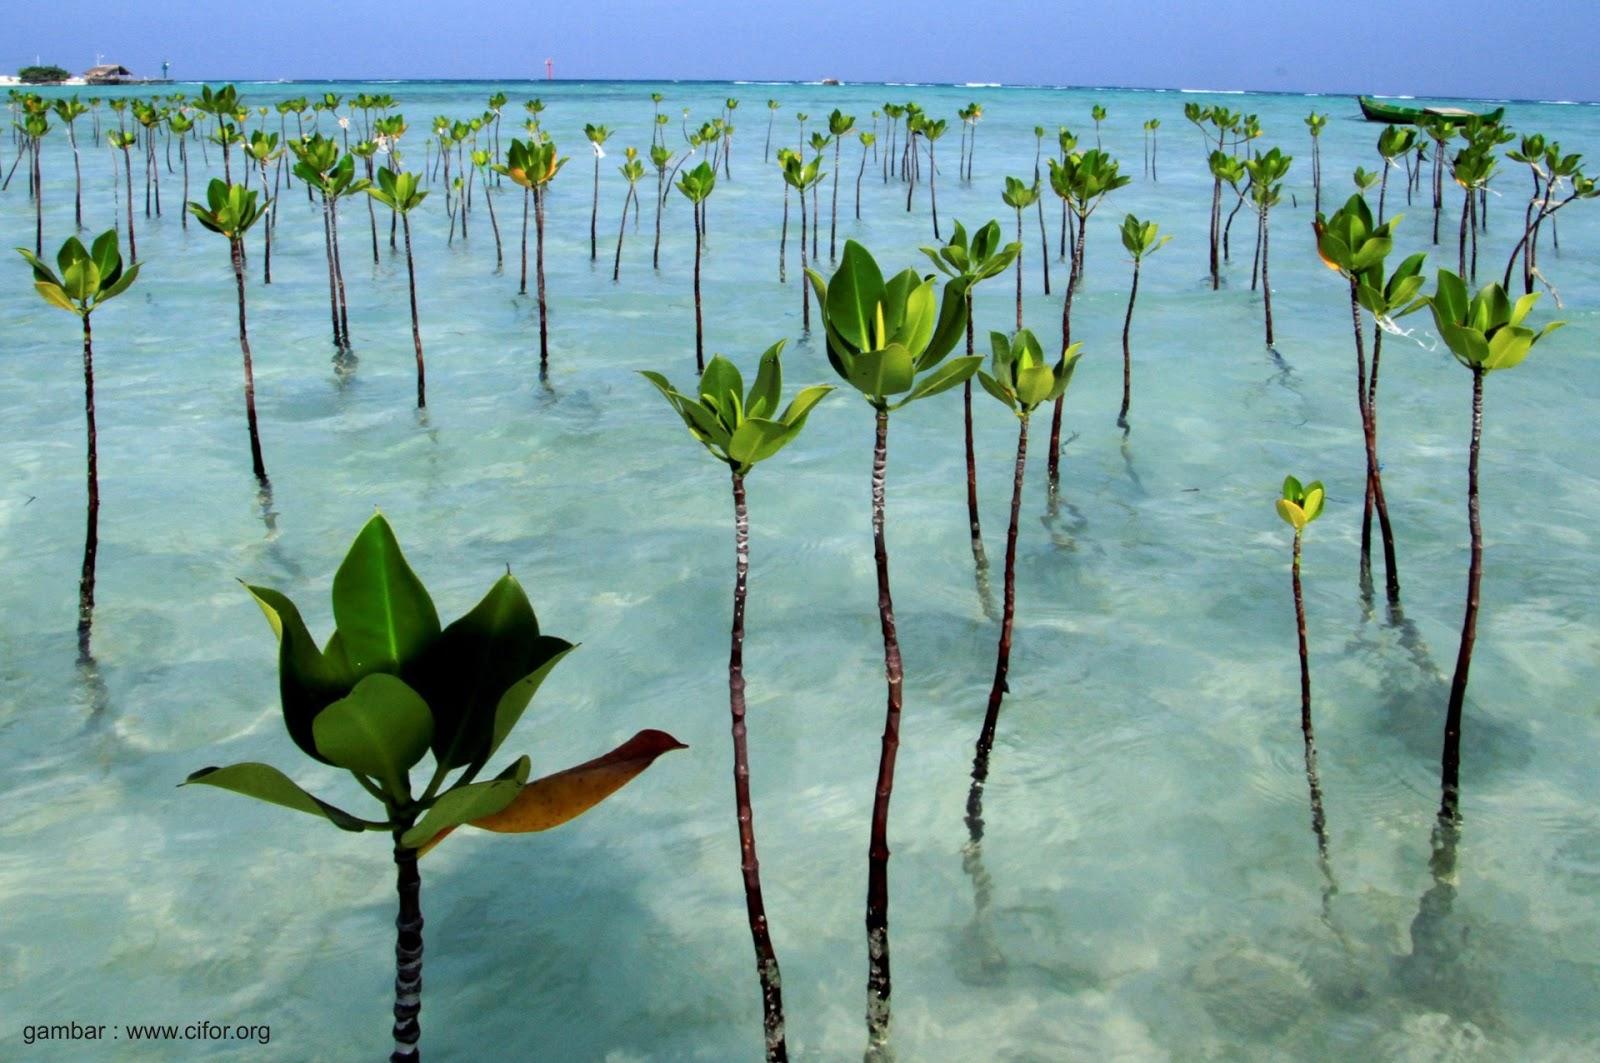 Jenis - Jenis Mangrove ~ AanBLOG